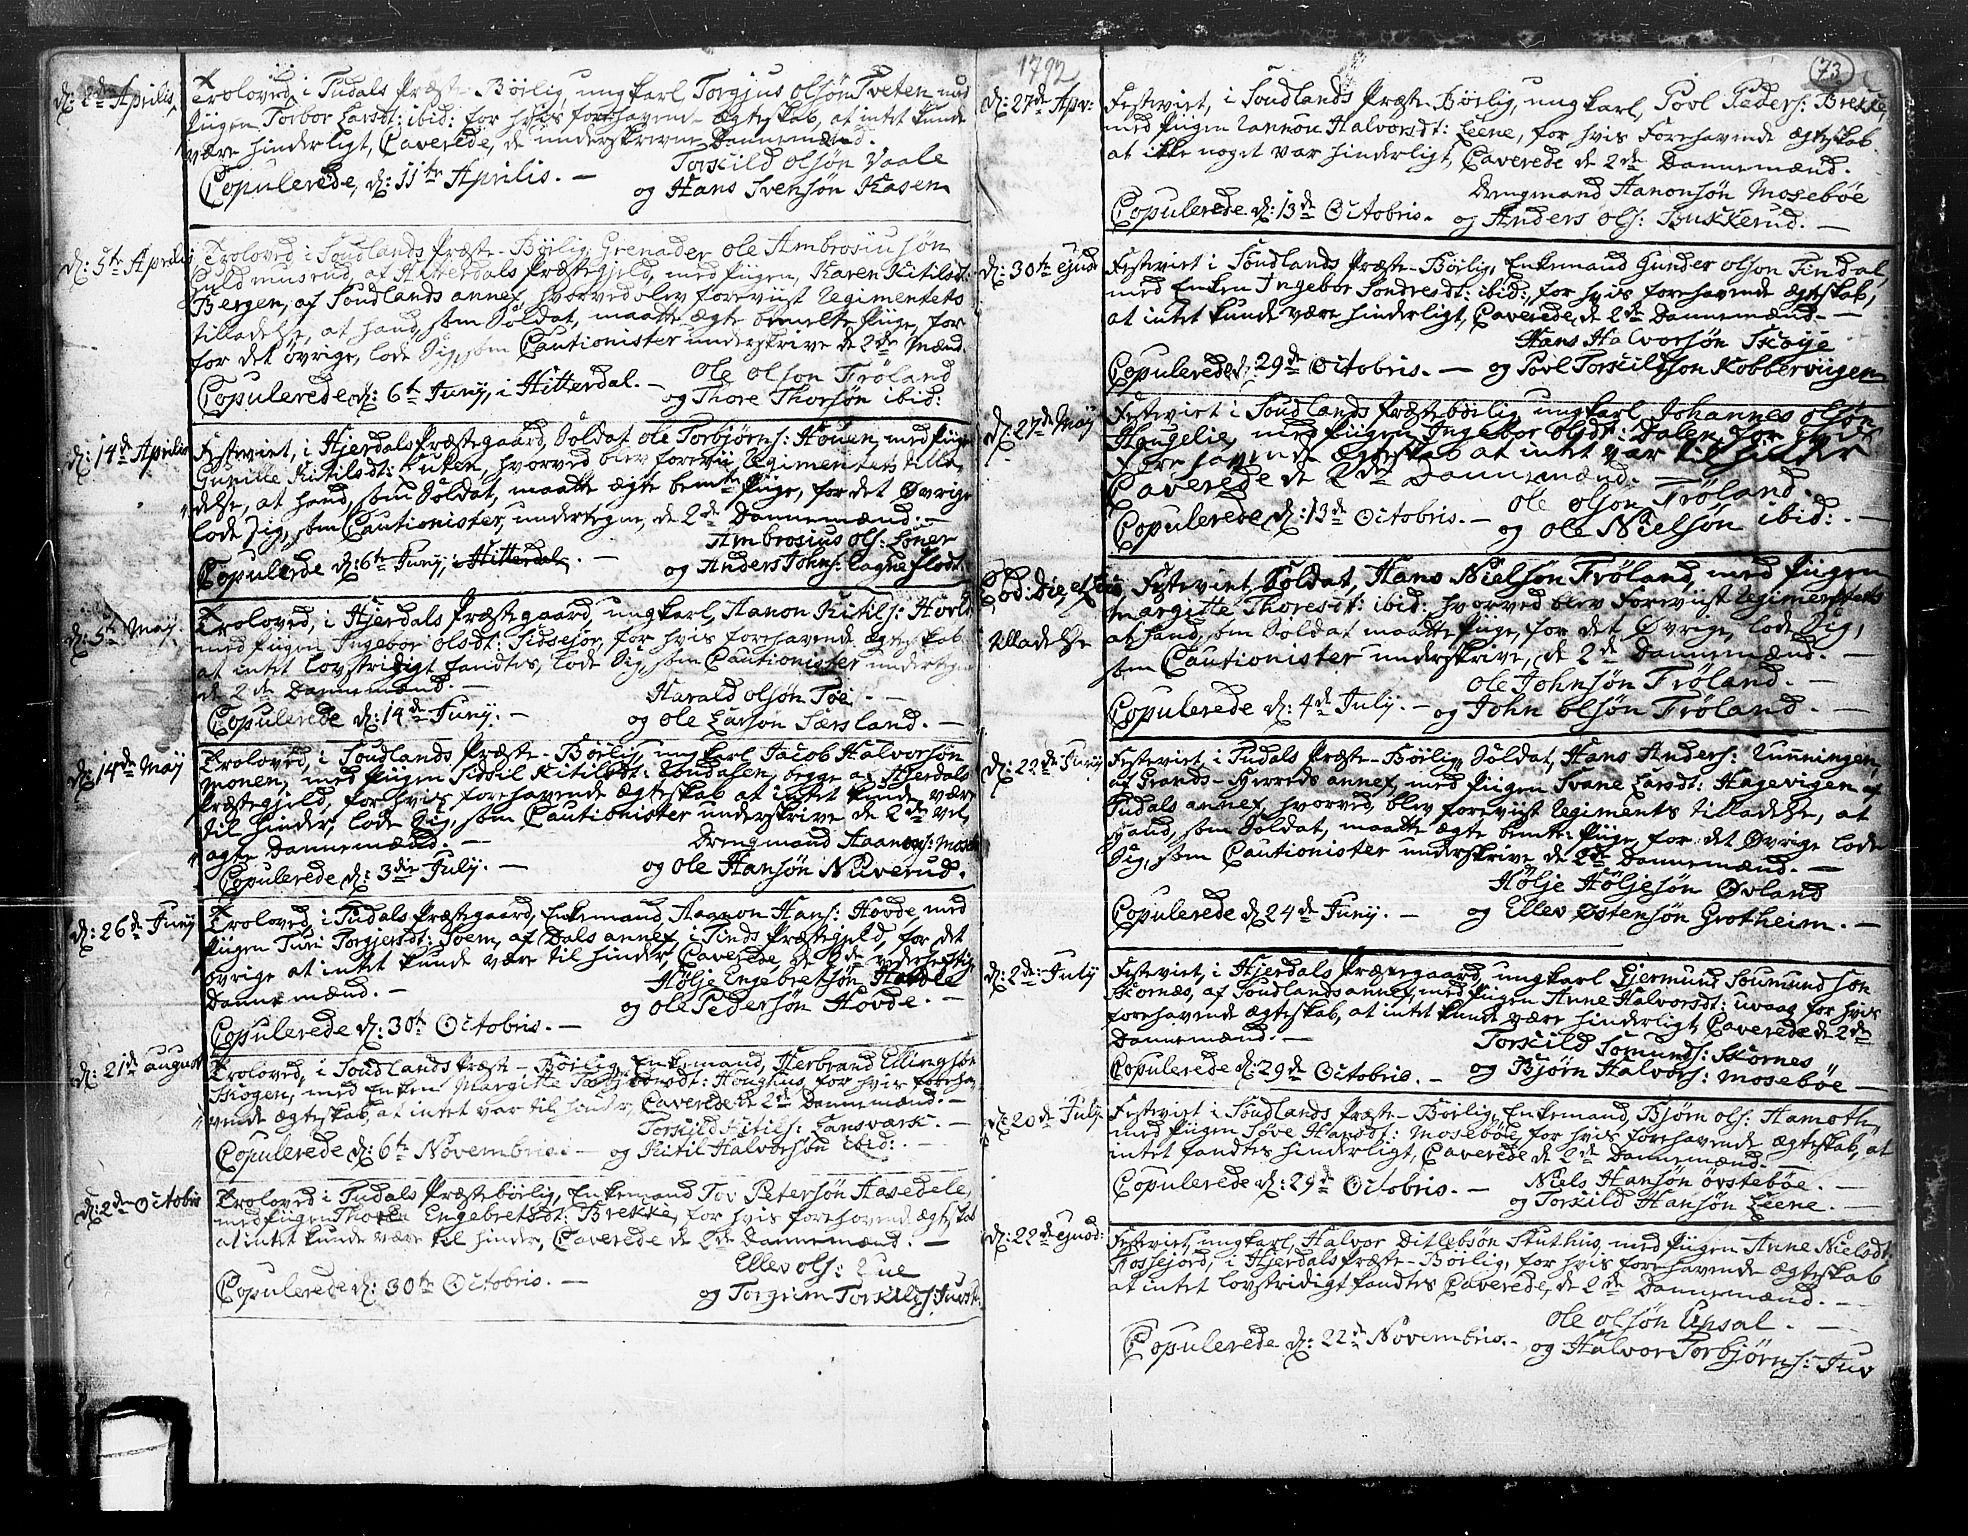 SAKO, Hjartdal kirkebøker, F/Fa/L0004: Ministerialbok nr. I 4, 1727-1795, s. 73